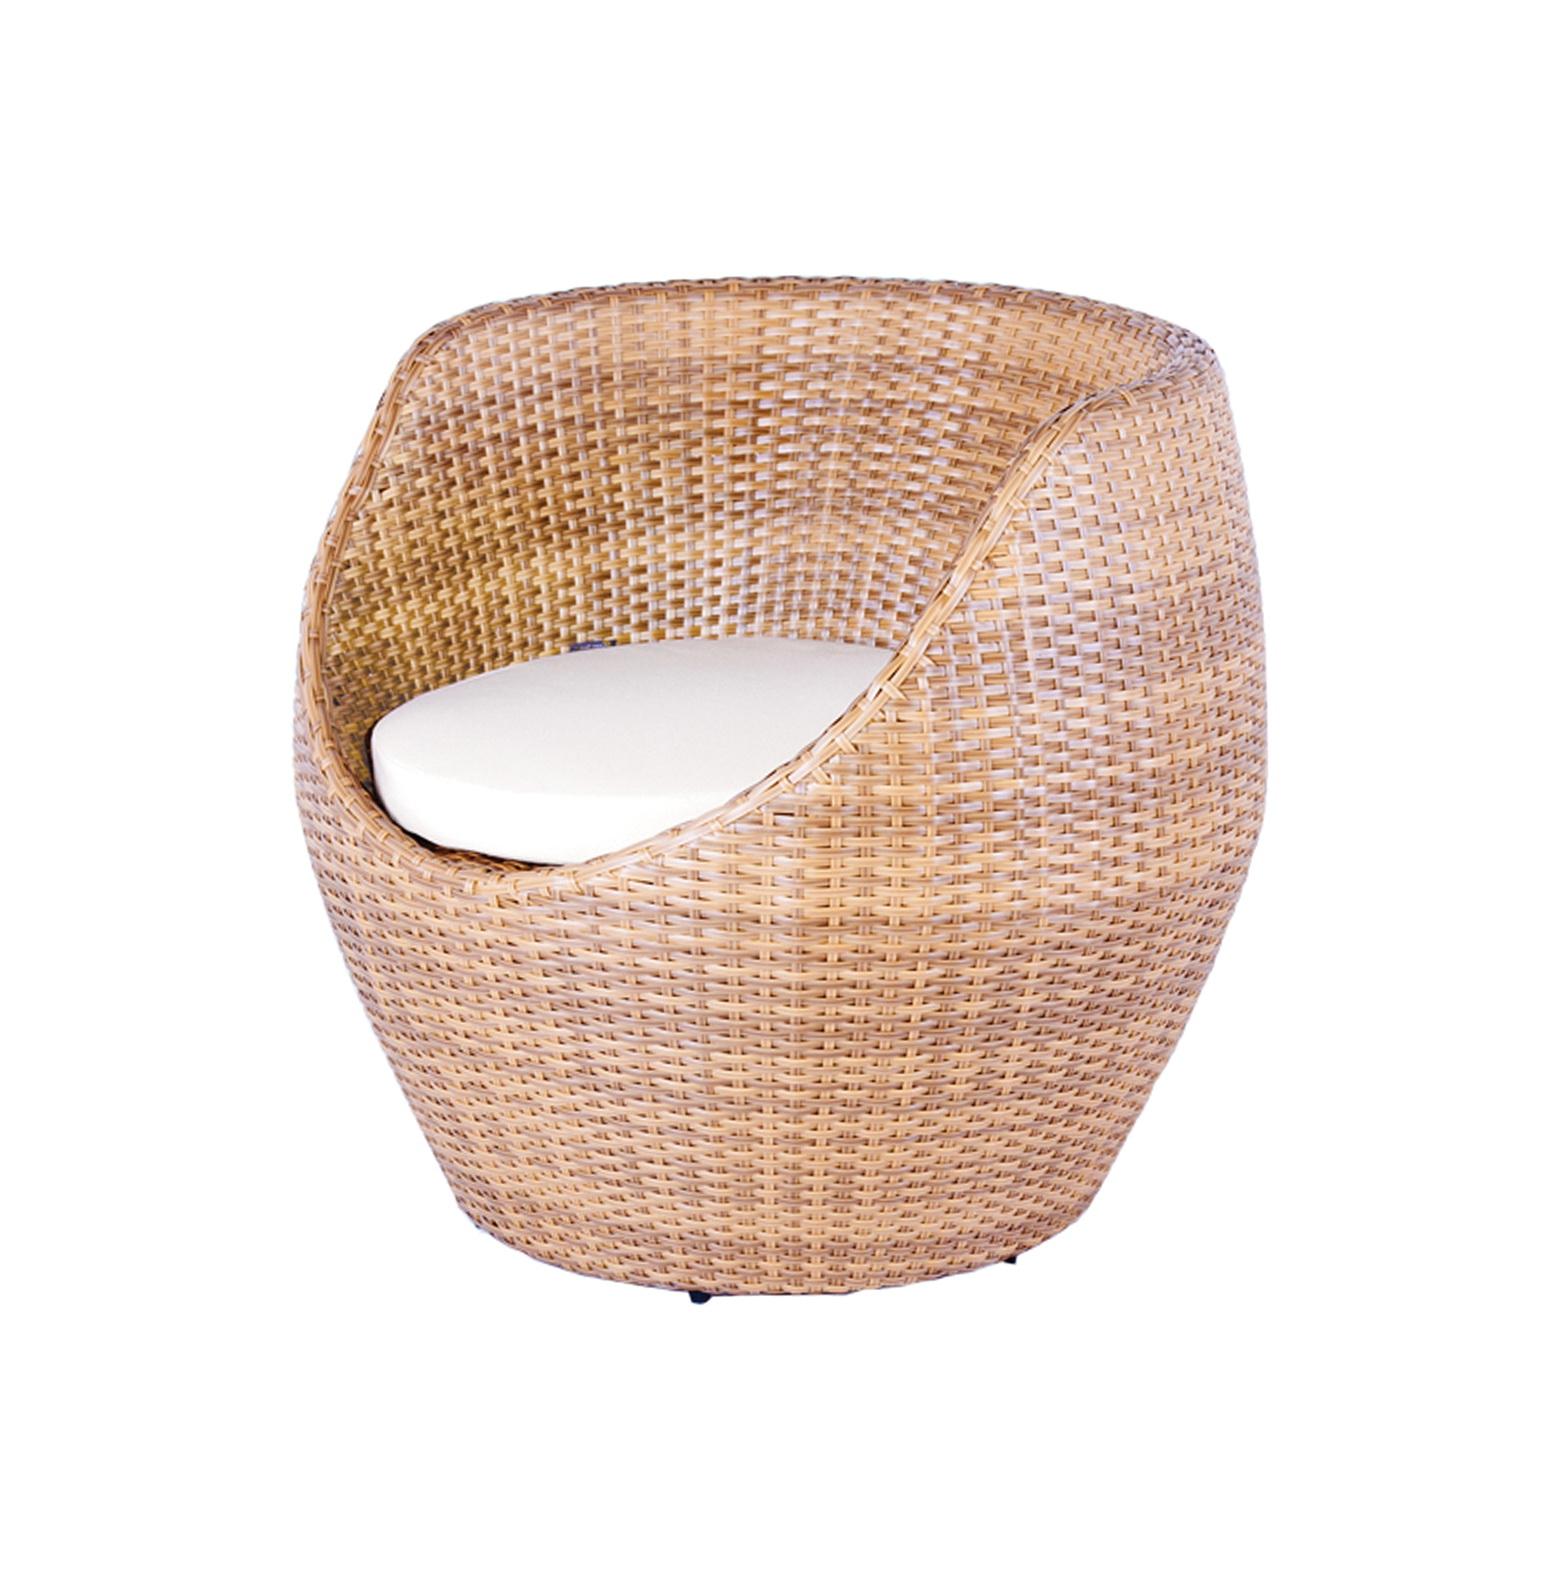 Round Wicker Chair Cushion